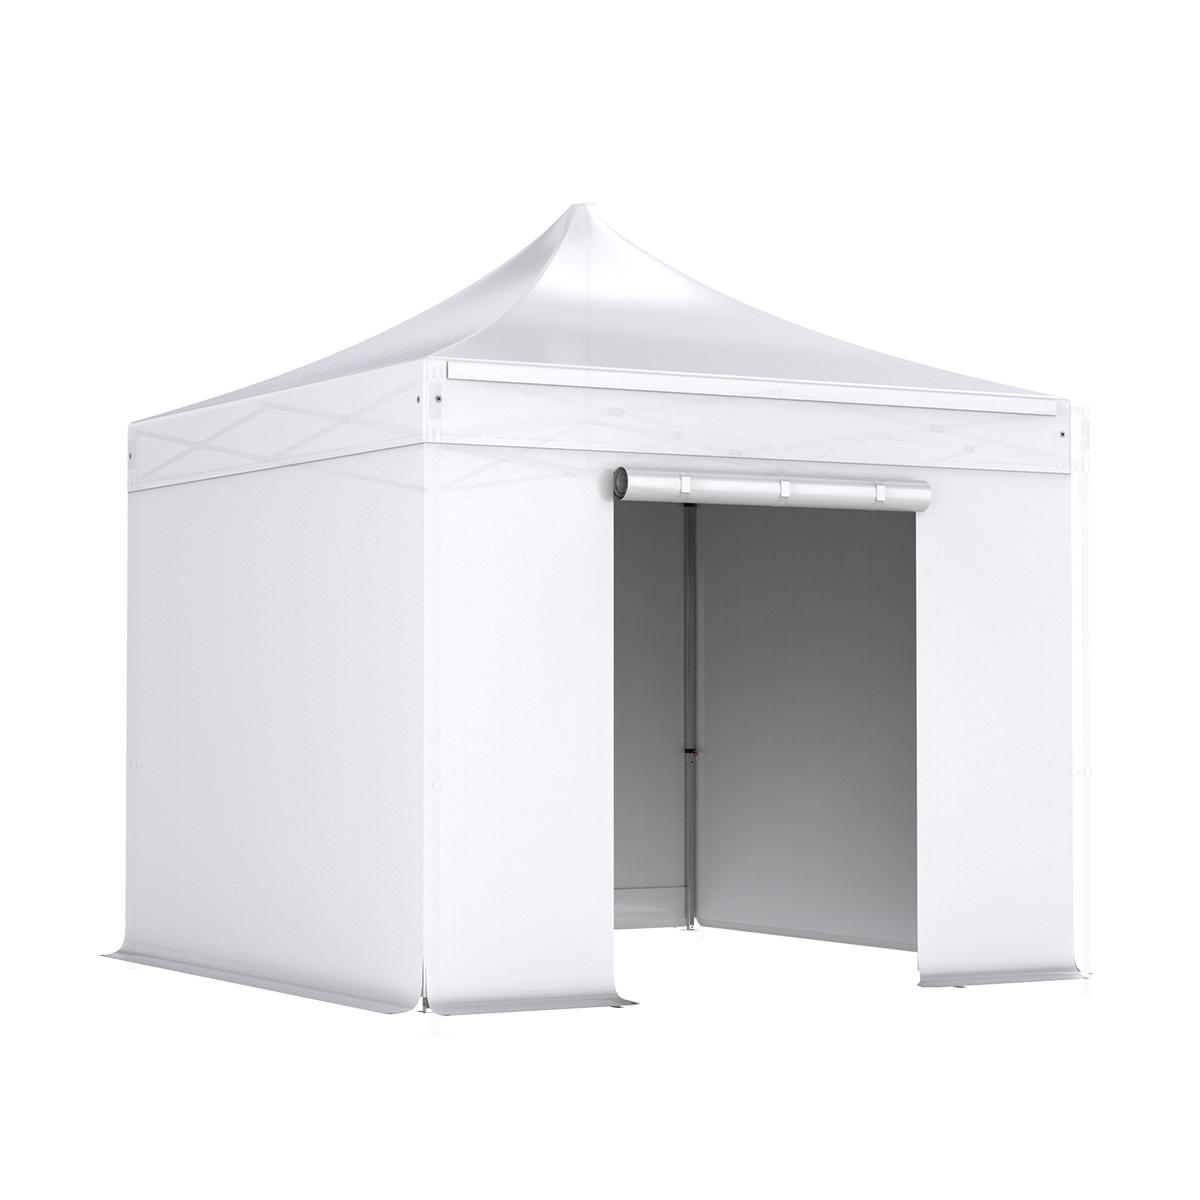 Stahl 32 mm Faltpavillon Komplett Set 3x3m, Planen 300g/m²